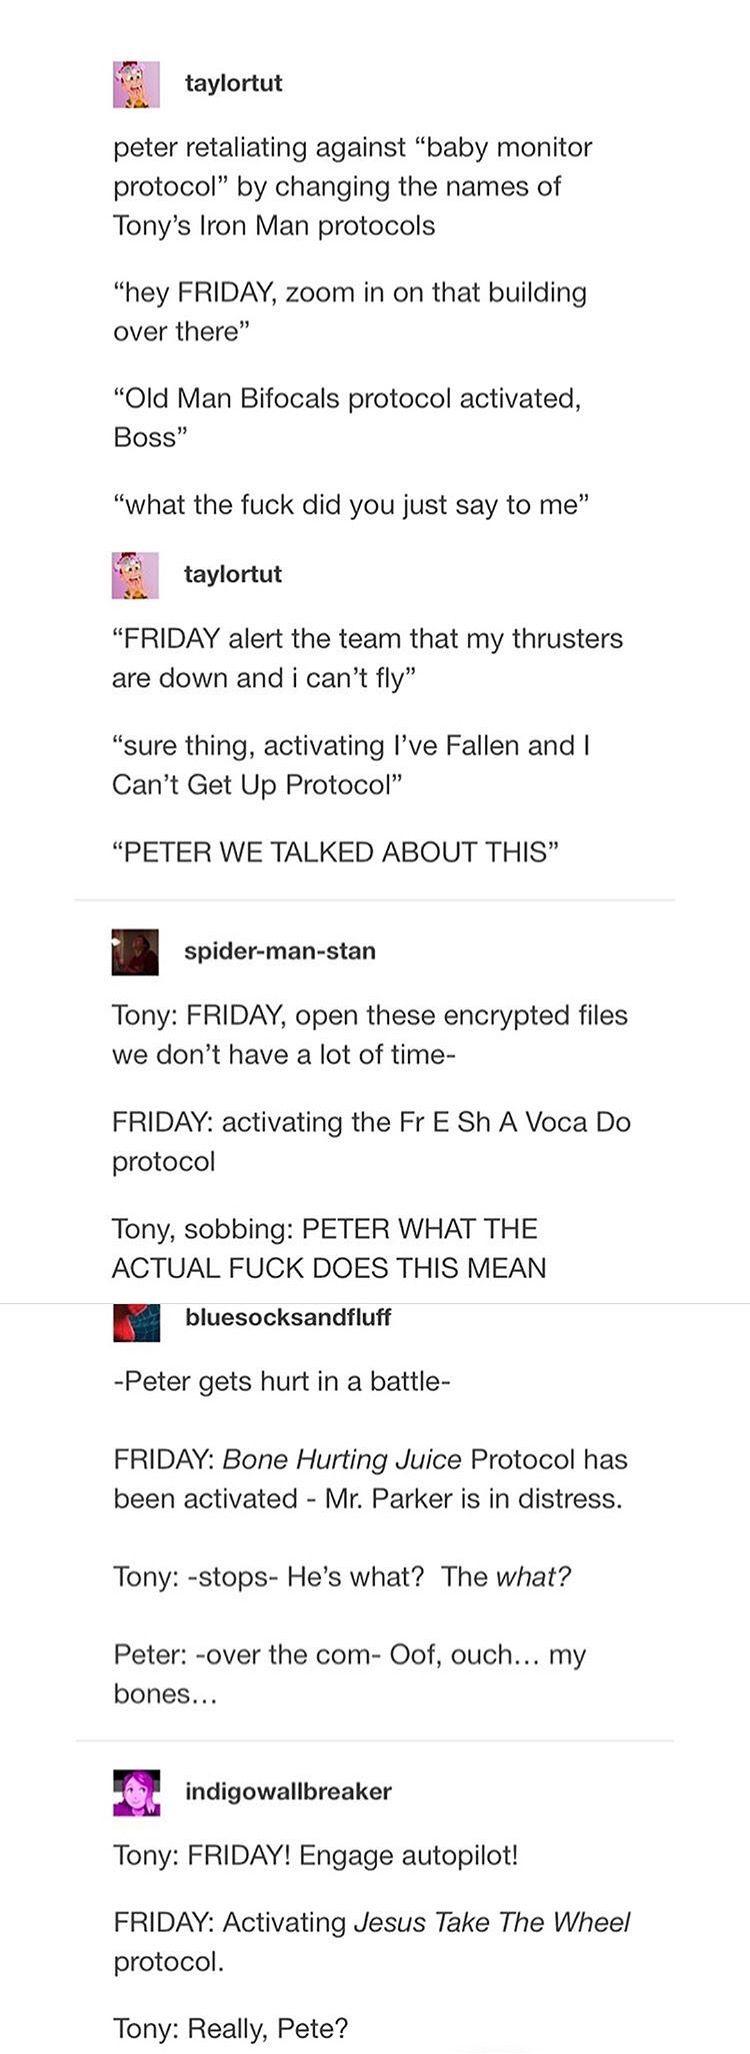 Hahahahahahahahahahahahaha The Last One And The Third One Tho